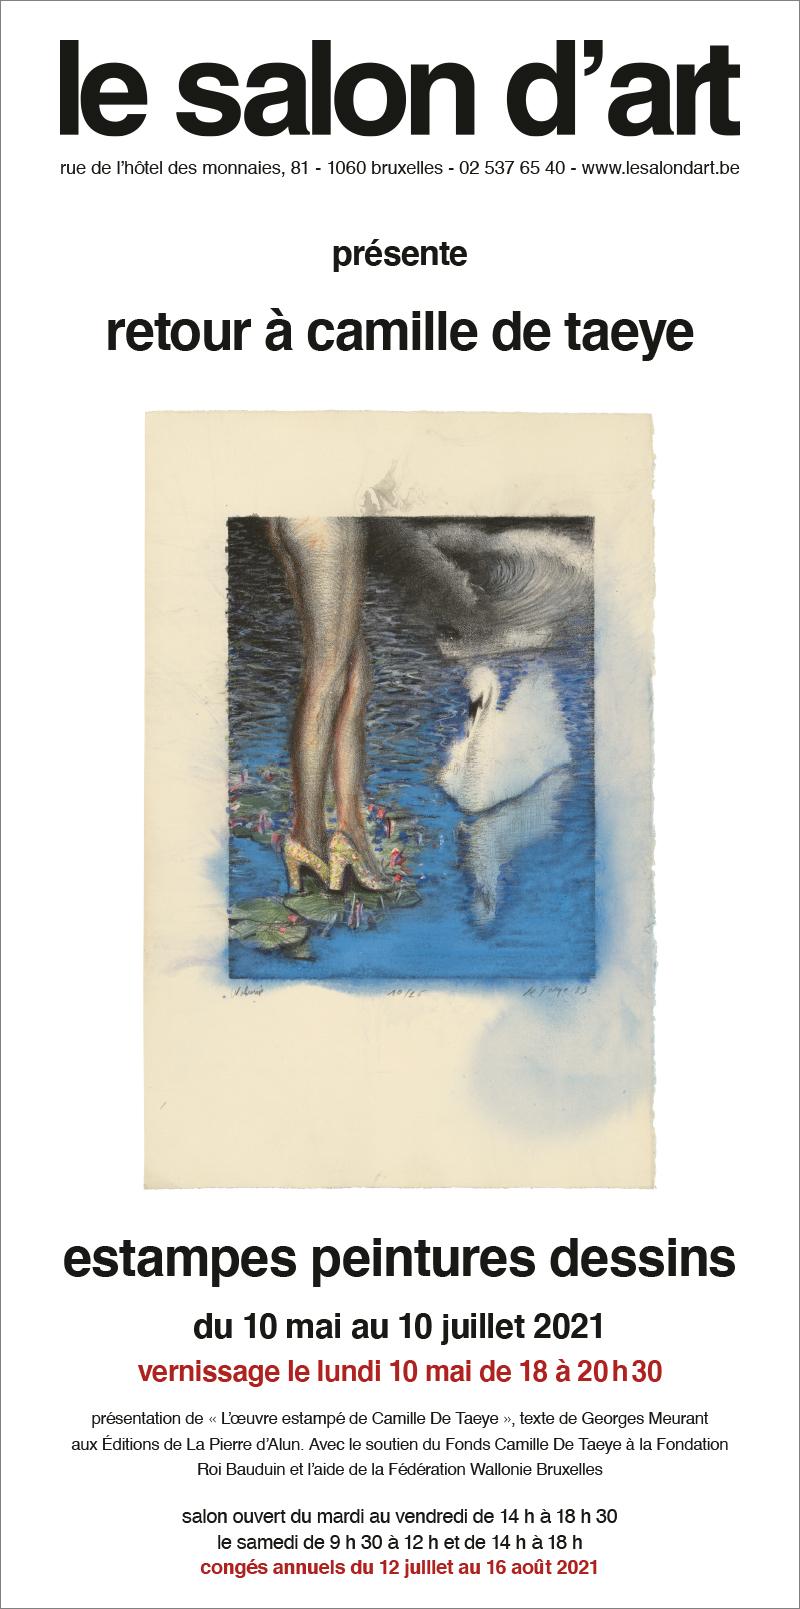 camille de taeye estampes, peintures et dessins